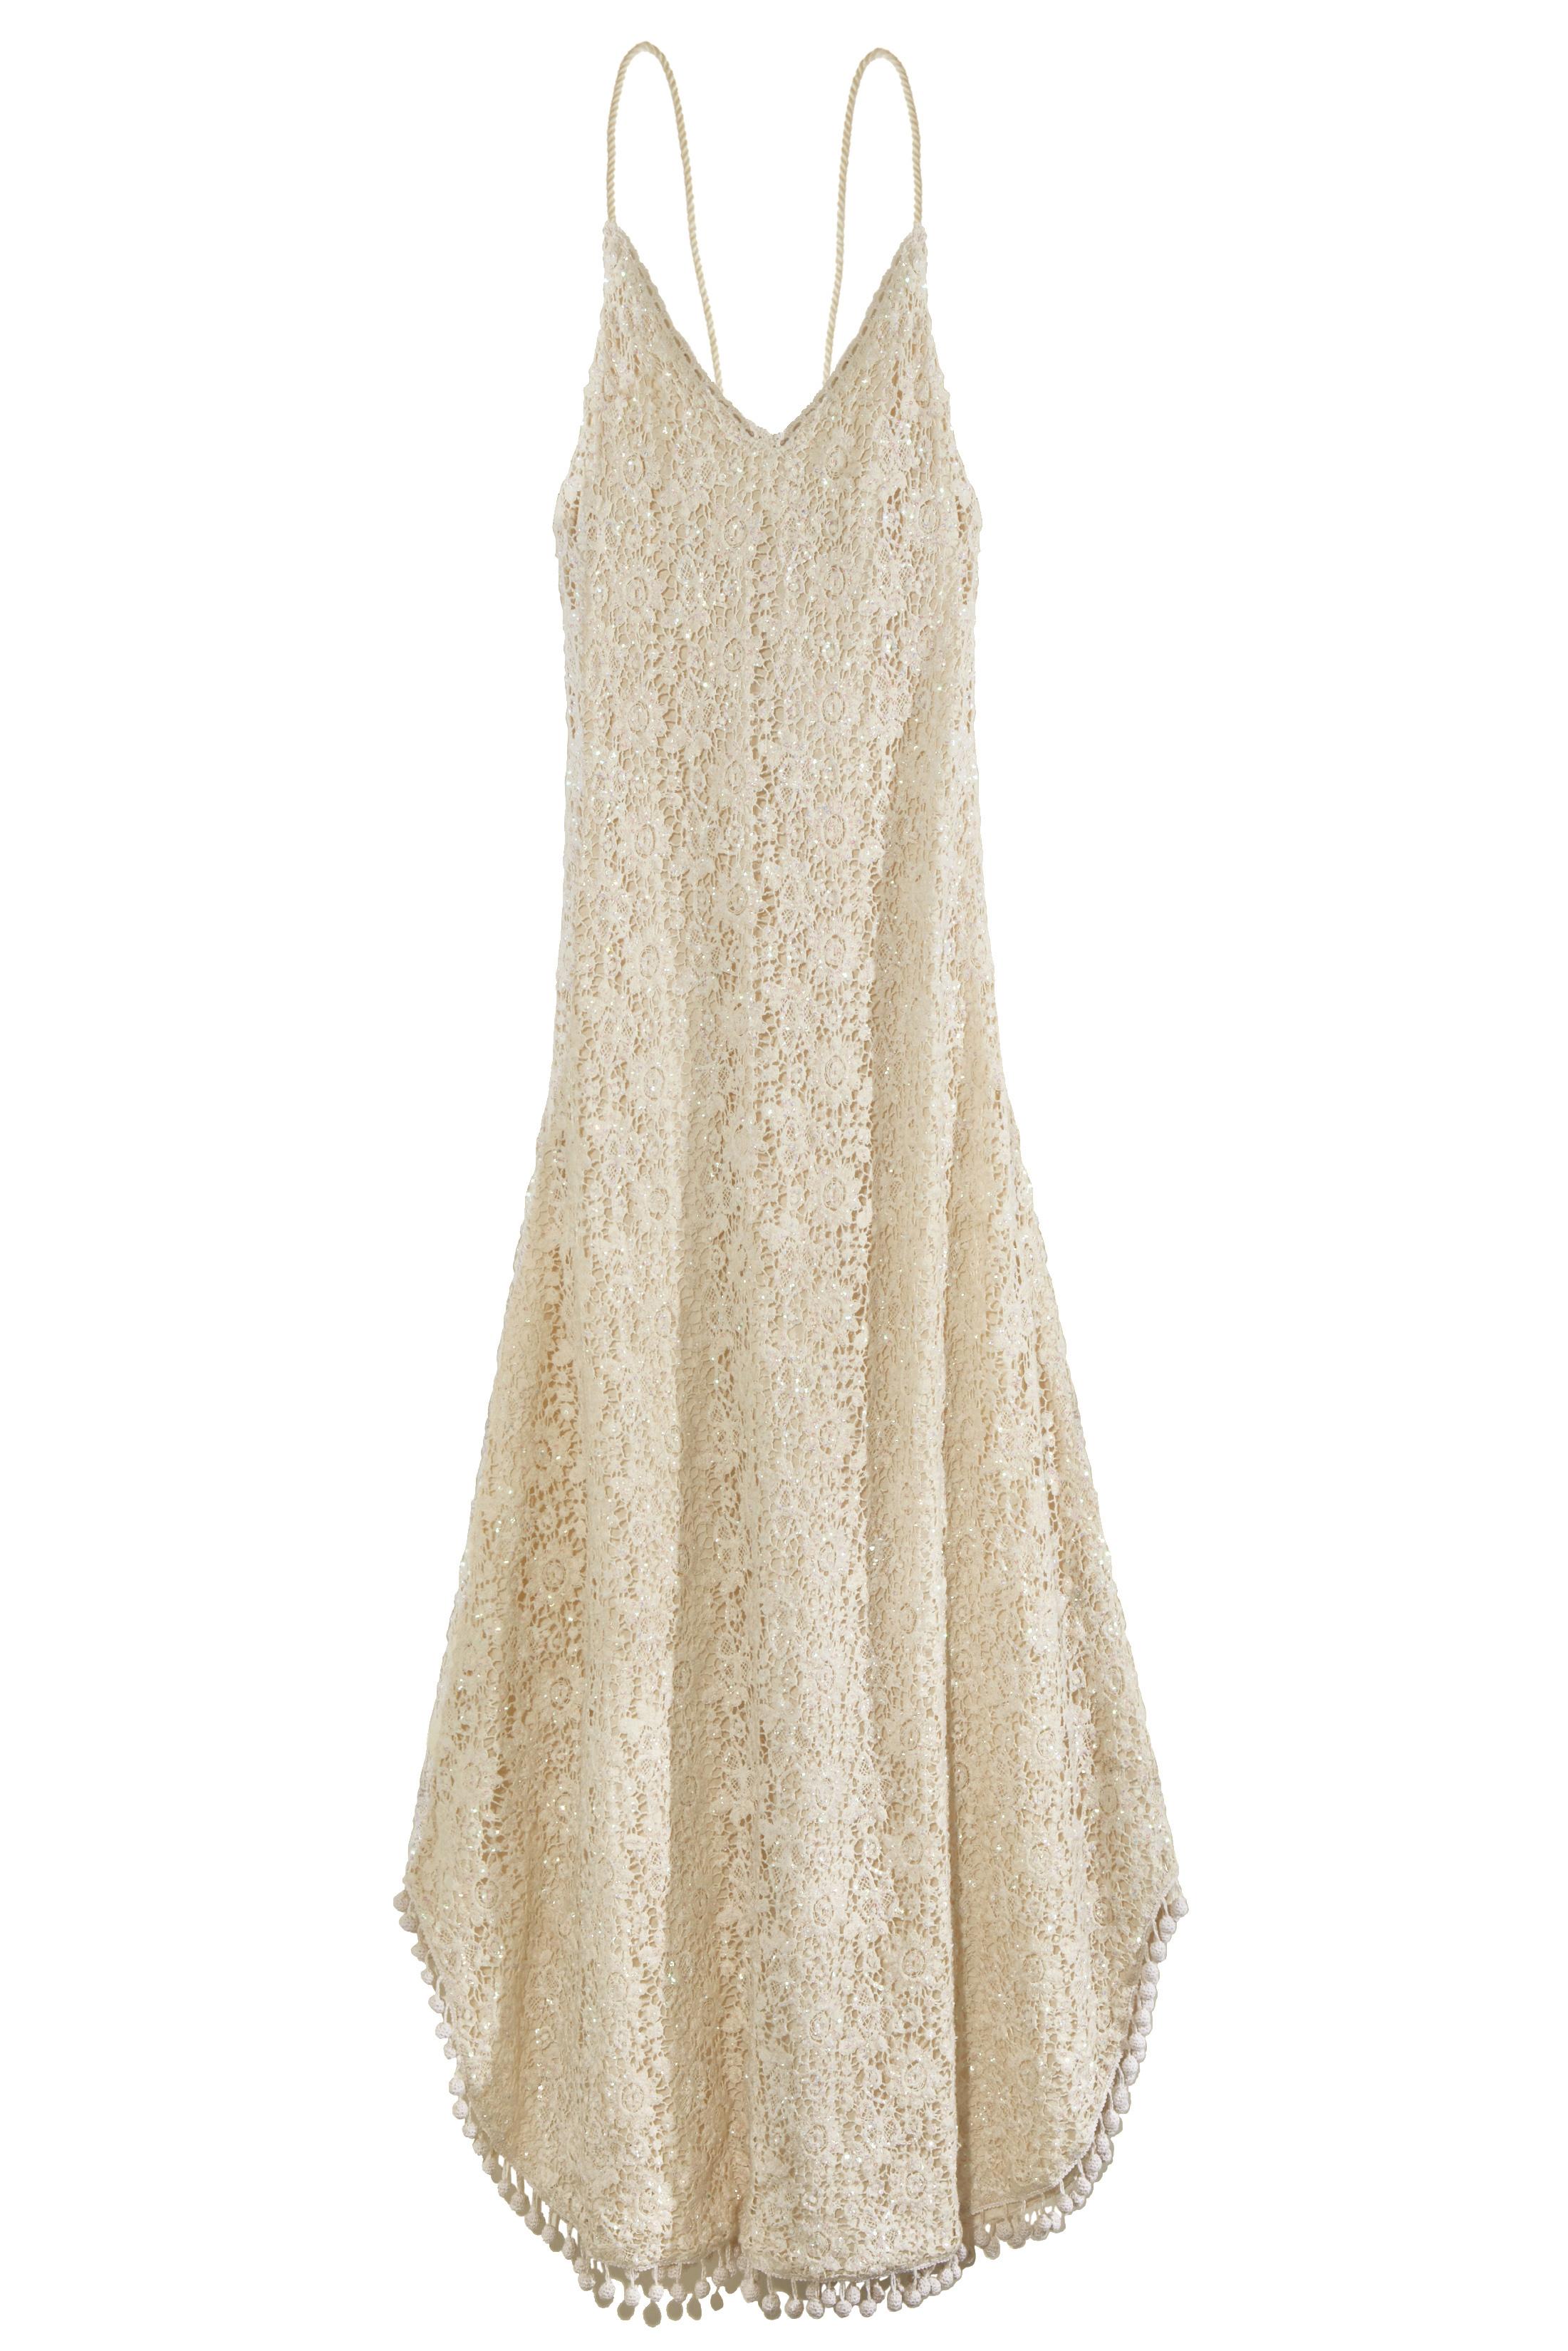 calypso-st-barth-bridal-evida-dress-0315.jpg